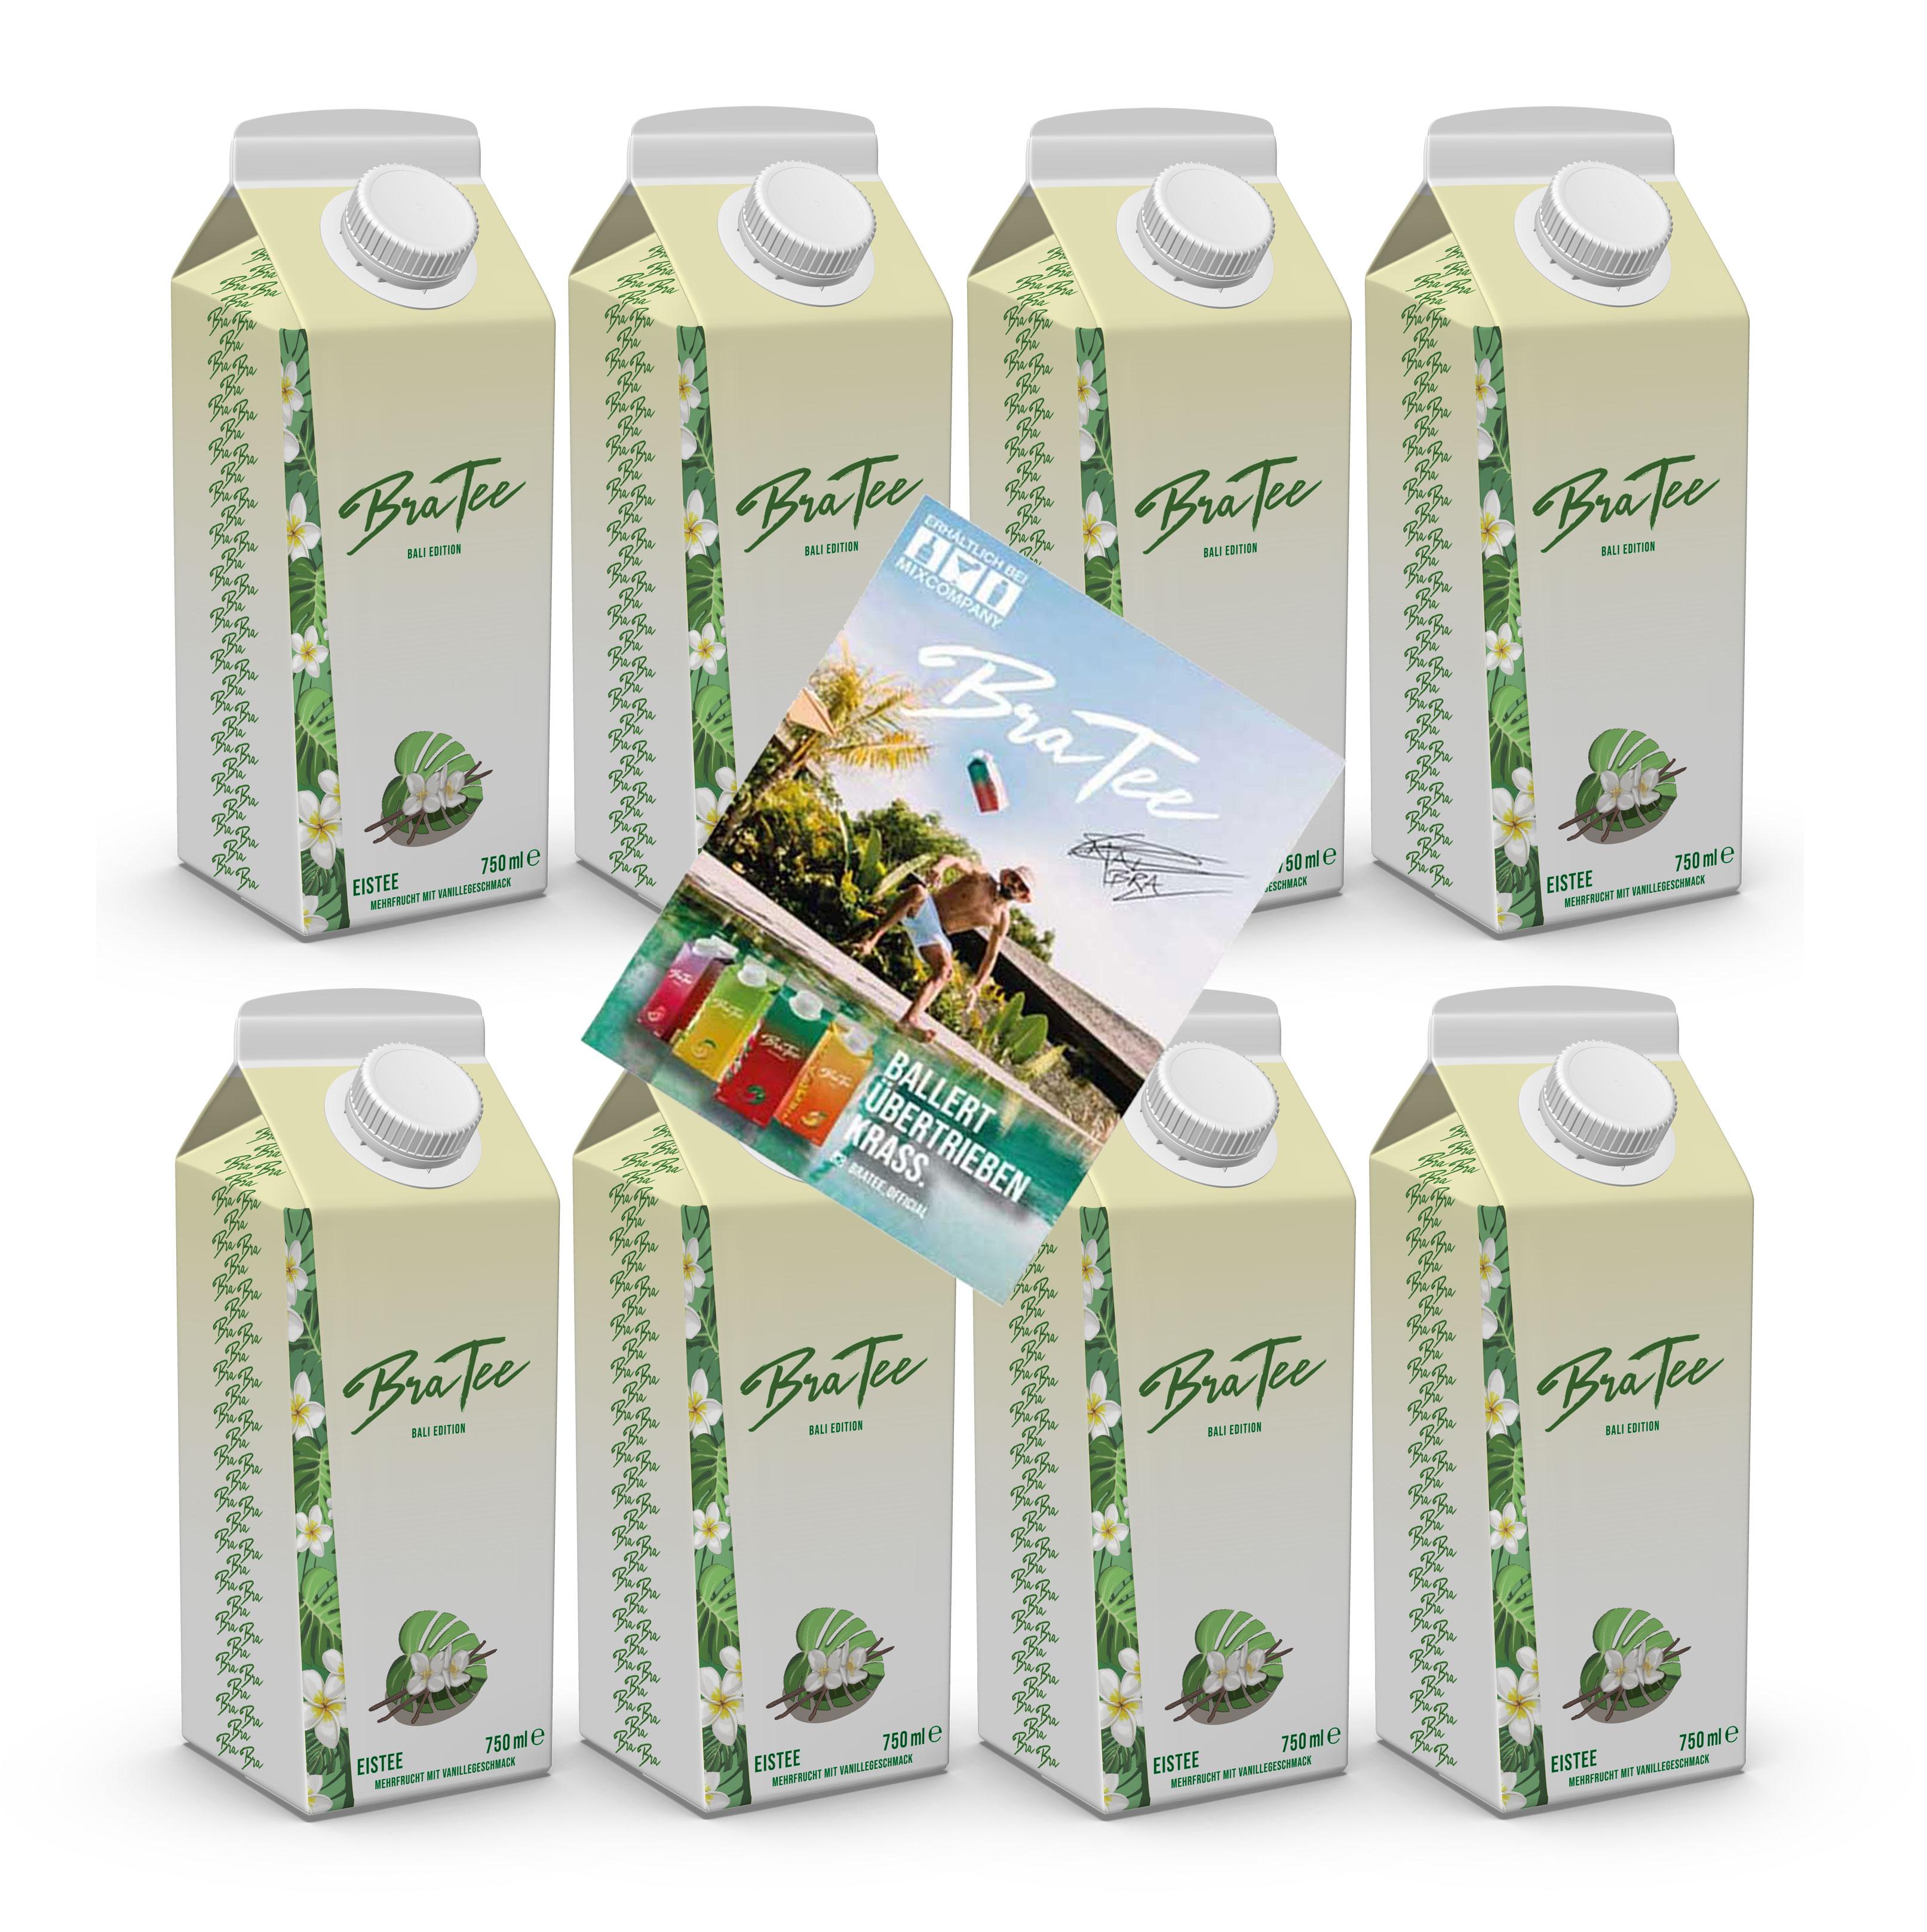 Capital BraTee Bali Edition 8er Set Special Eistee je 750ml + Autogrammkarte BRATEE Limited Edition Ice tea Mehrfrucht mit Vanillegeschmack mit Capi-Qualitäts-Siegel - Du weisst Bescheid